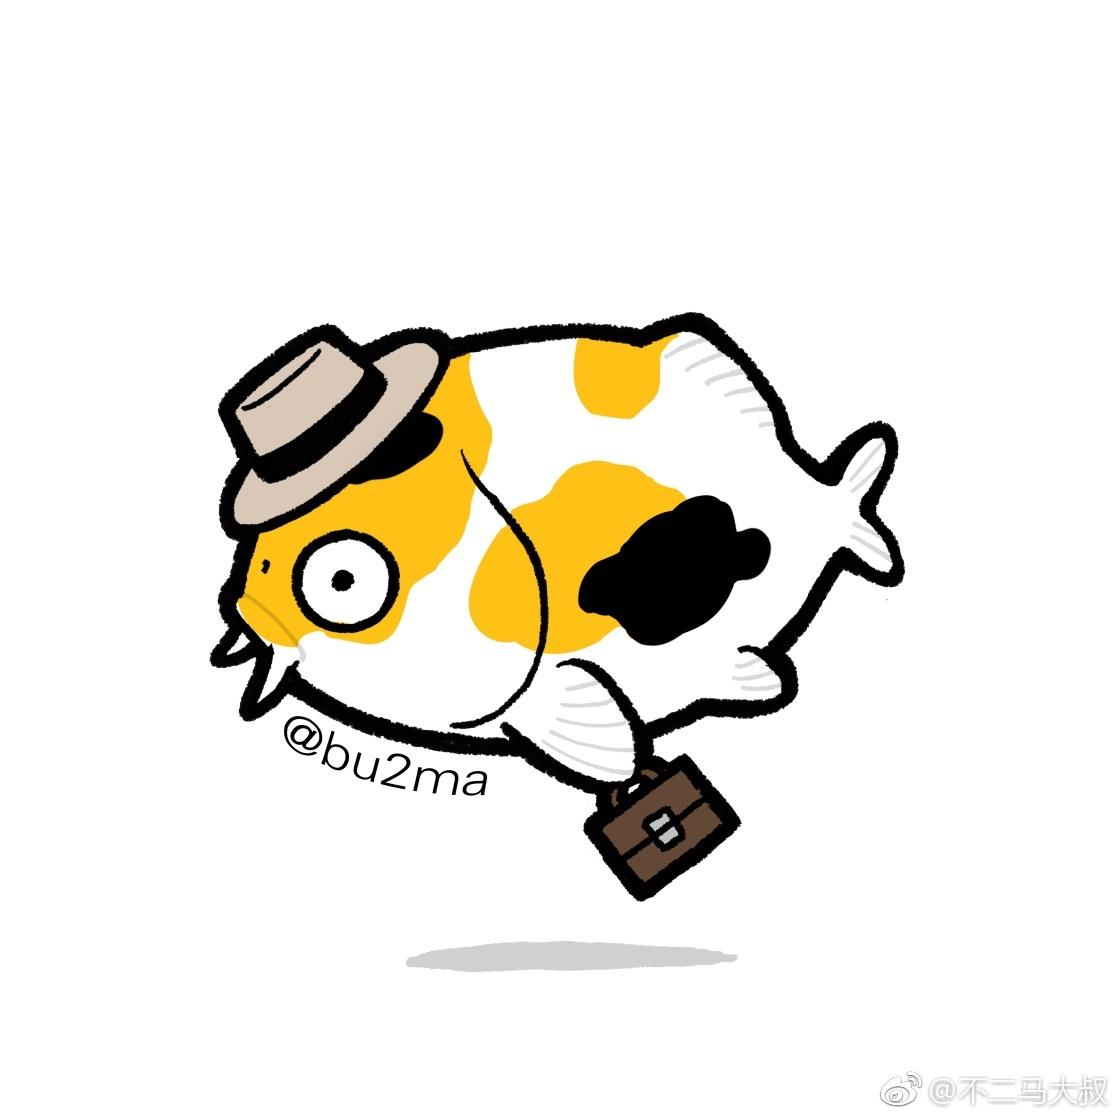 Mr. Koi goes to work.💼2⃣ 鯉さんは仕事に行きます。💼2⃣  #Bu2ma #Koicarp #illustration #cute #不二马大叔 #不二马   #イラストレーション #シャーク #鯉 #ネタ